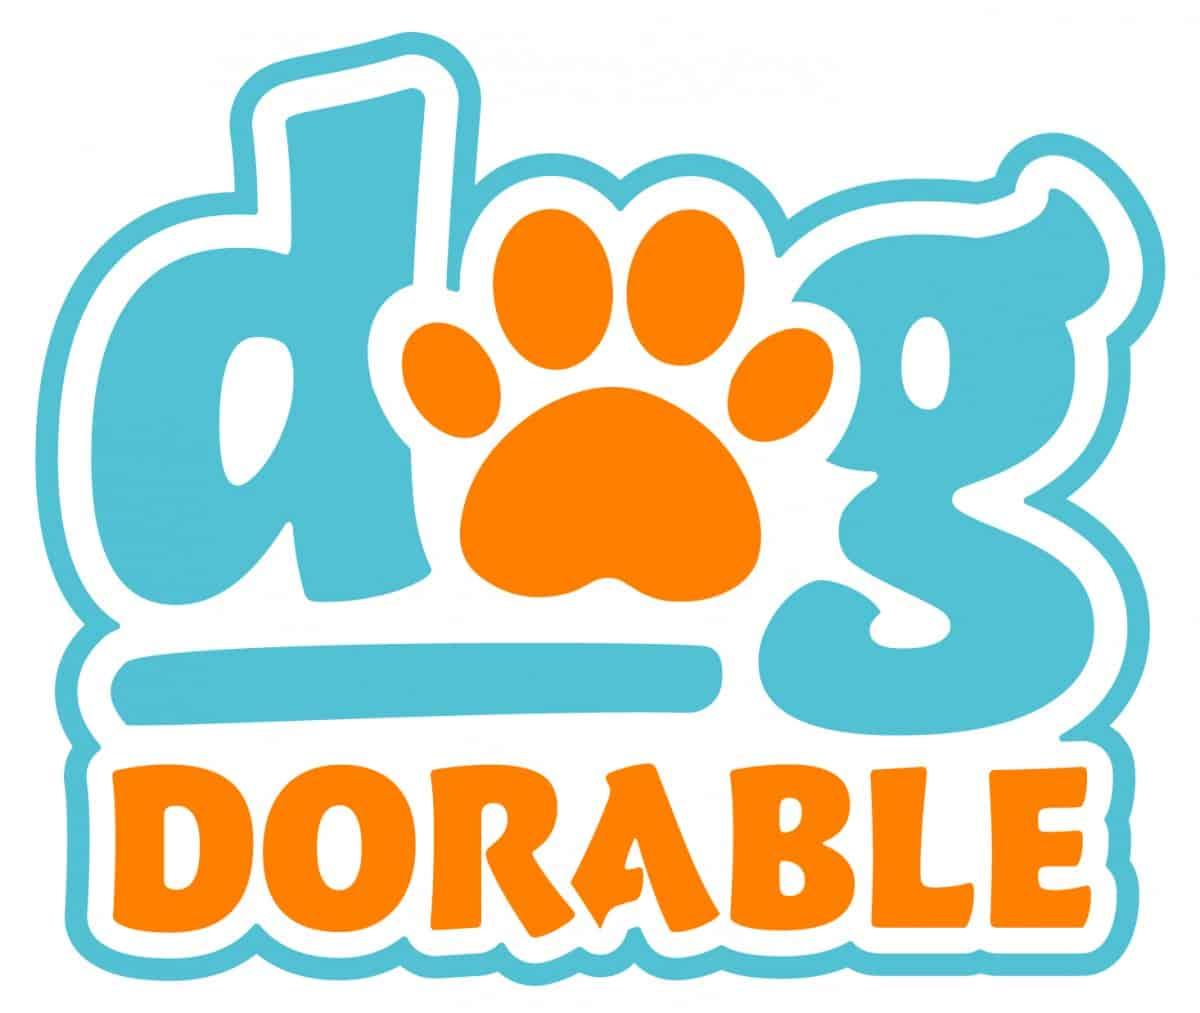 Dogdorable